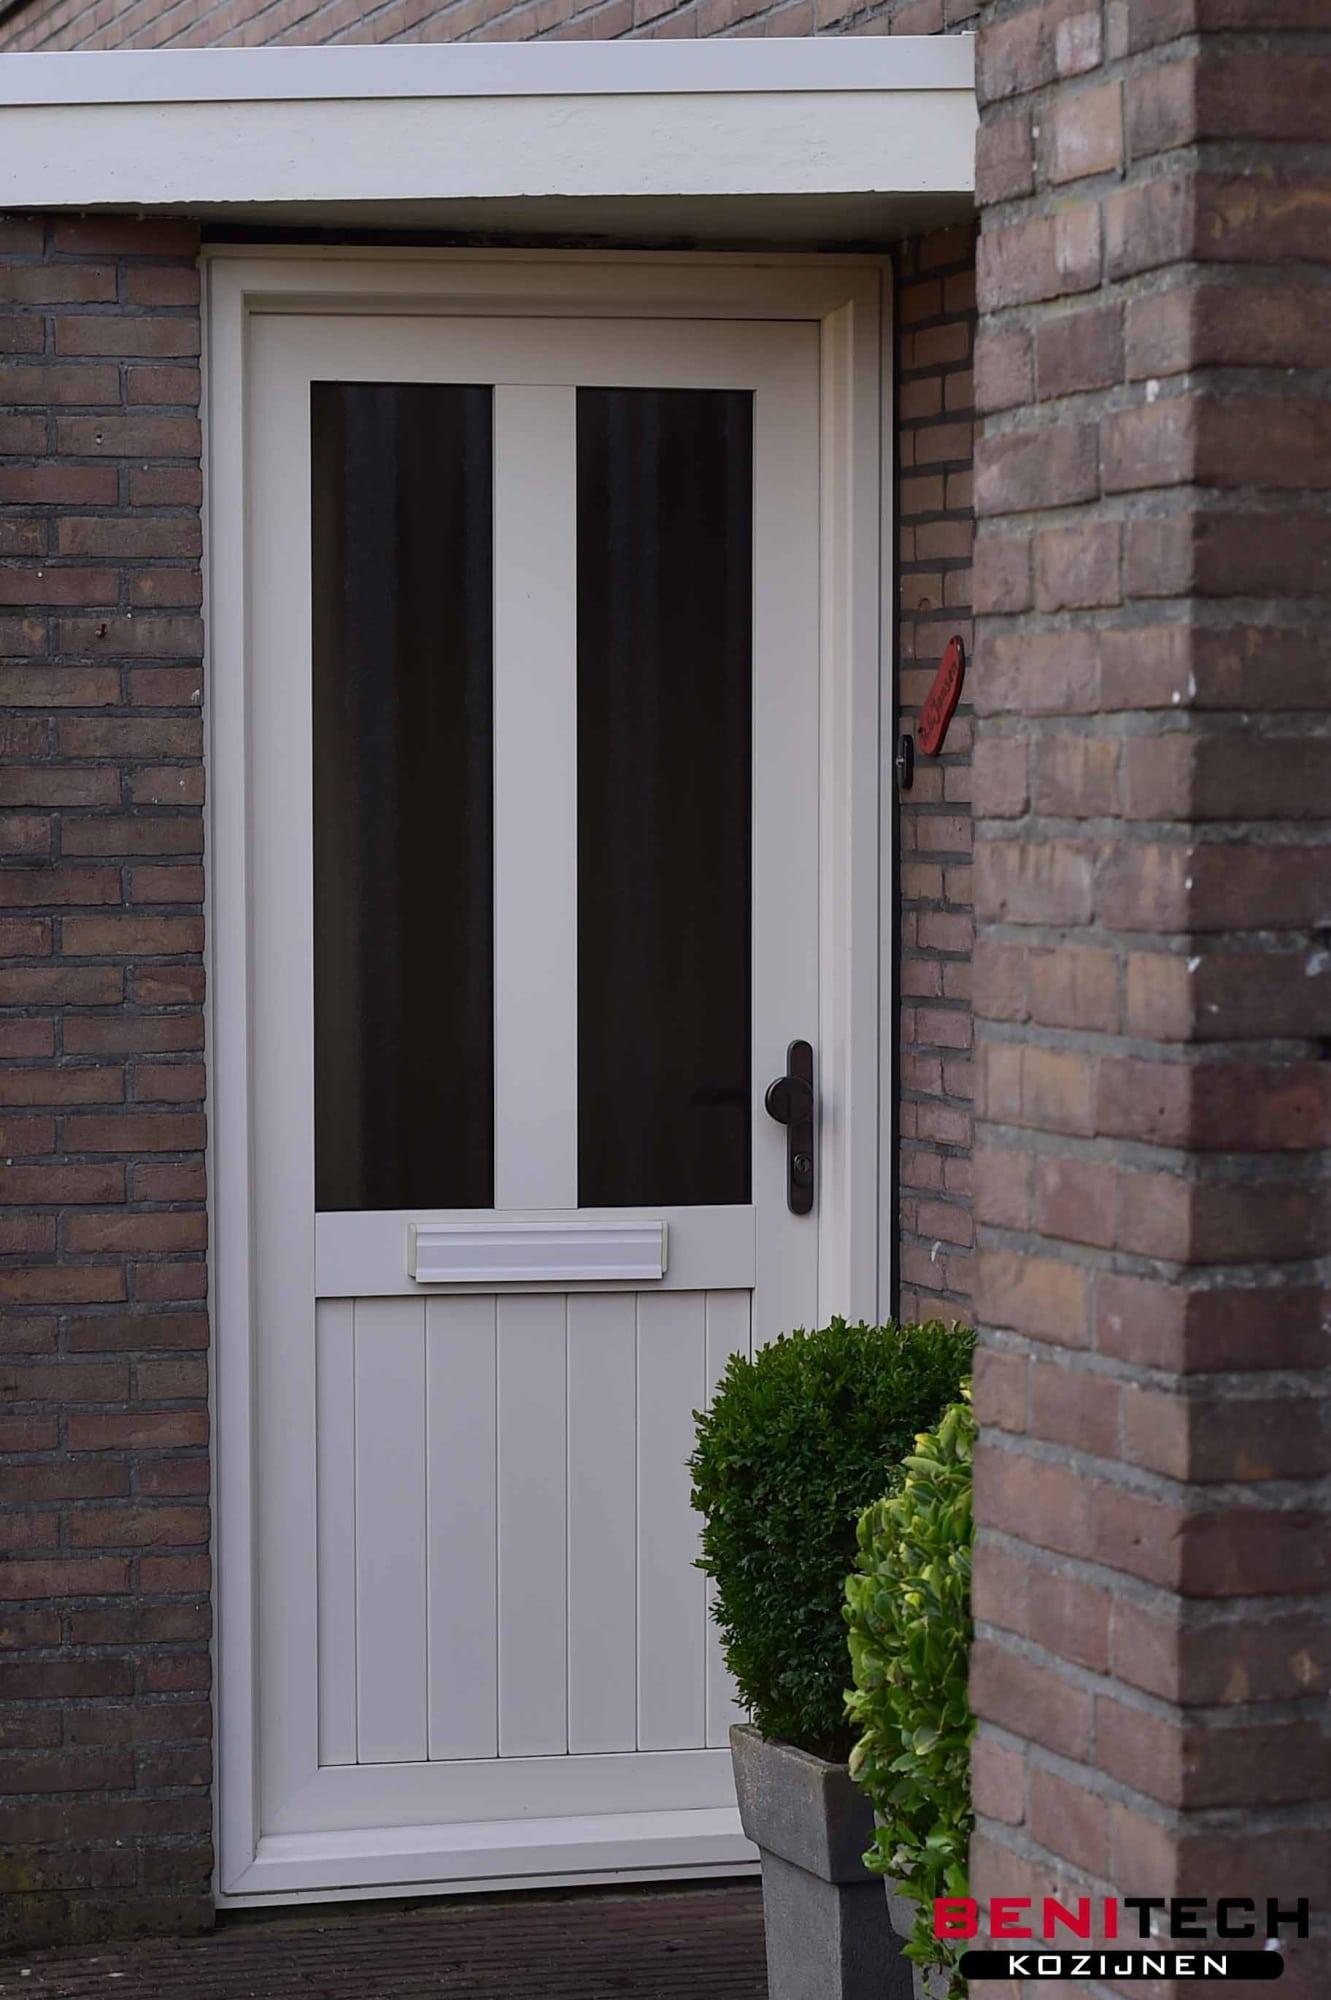 Kunststof voordeur ontwerp uw eigen deur kies uit meer for Witte kunstof eetkamerstoelen